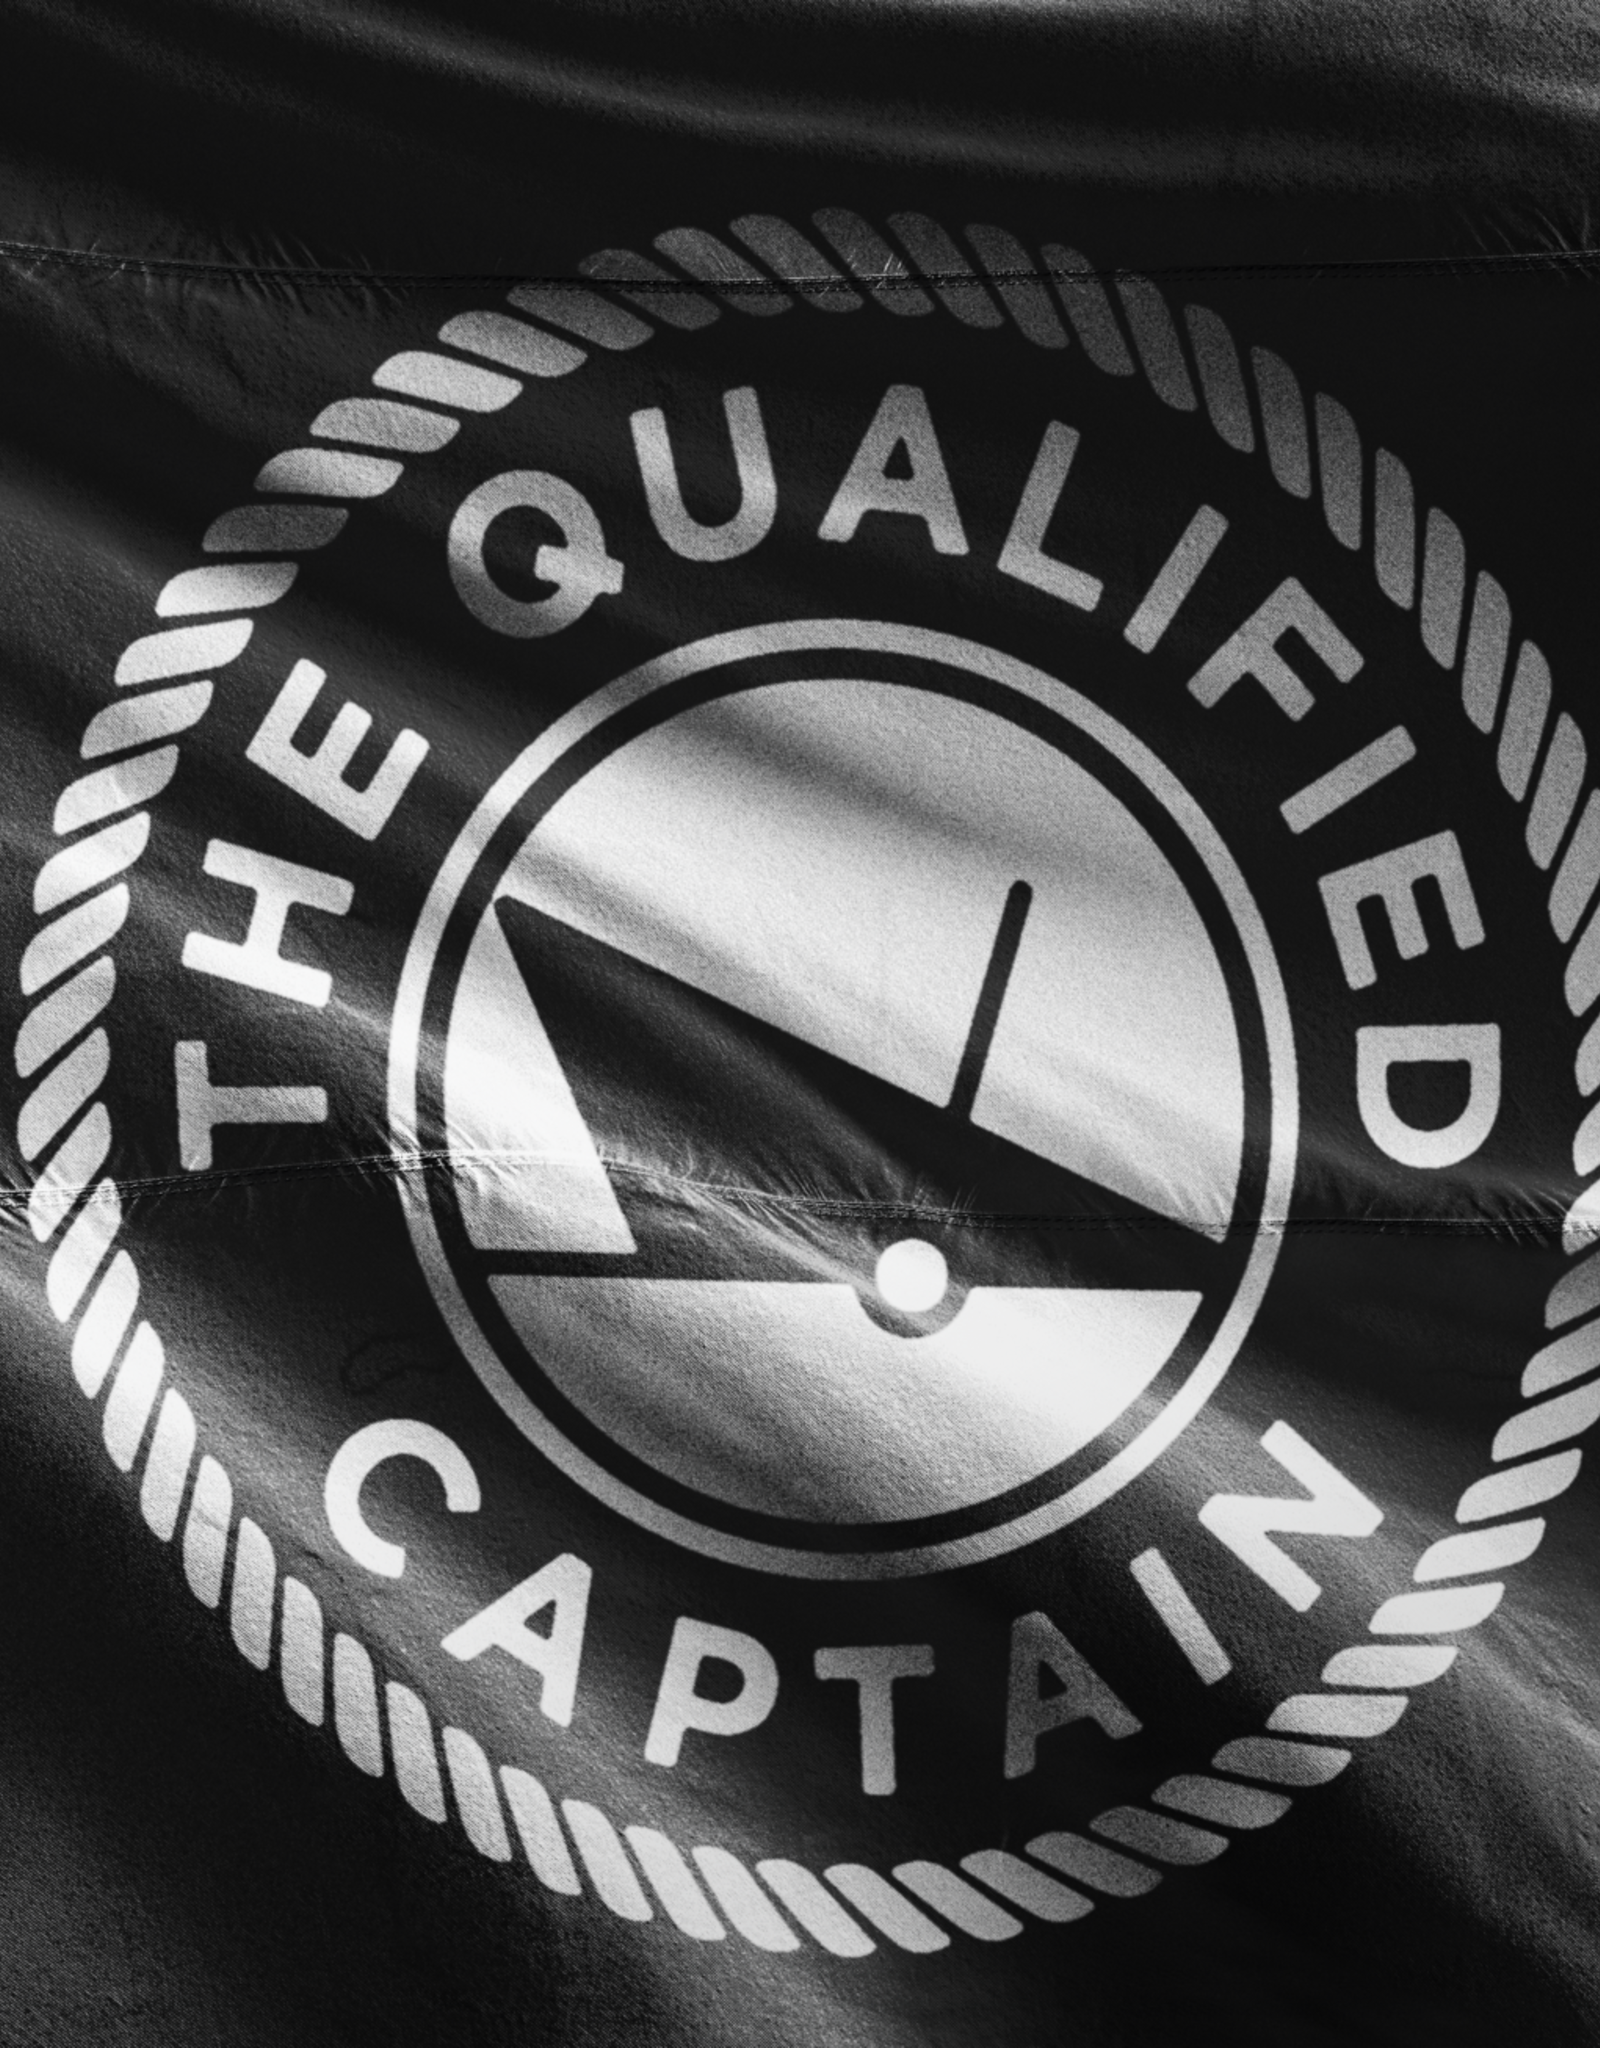 Qualified Captain Qualified Captain   2x3 Flag